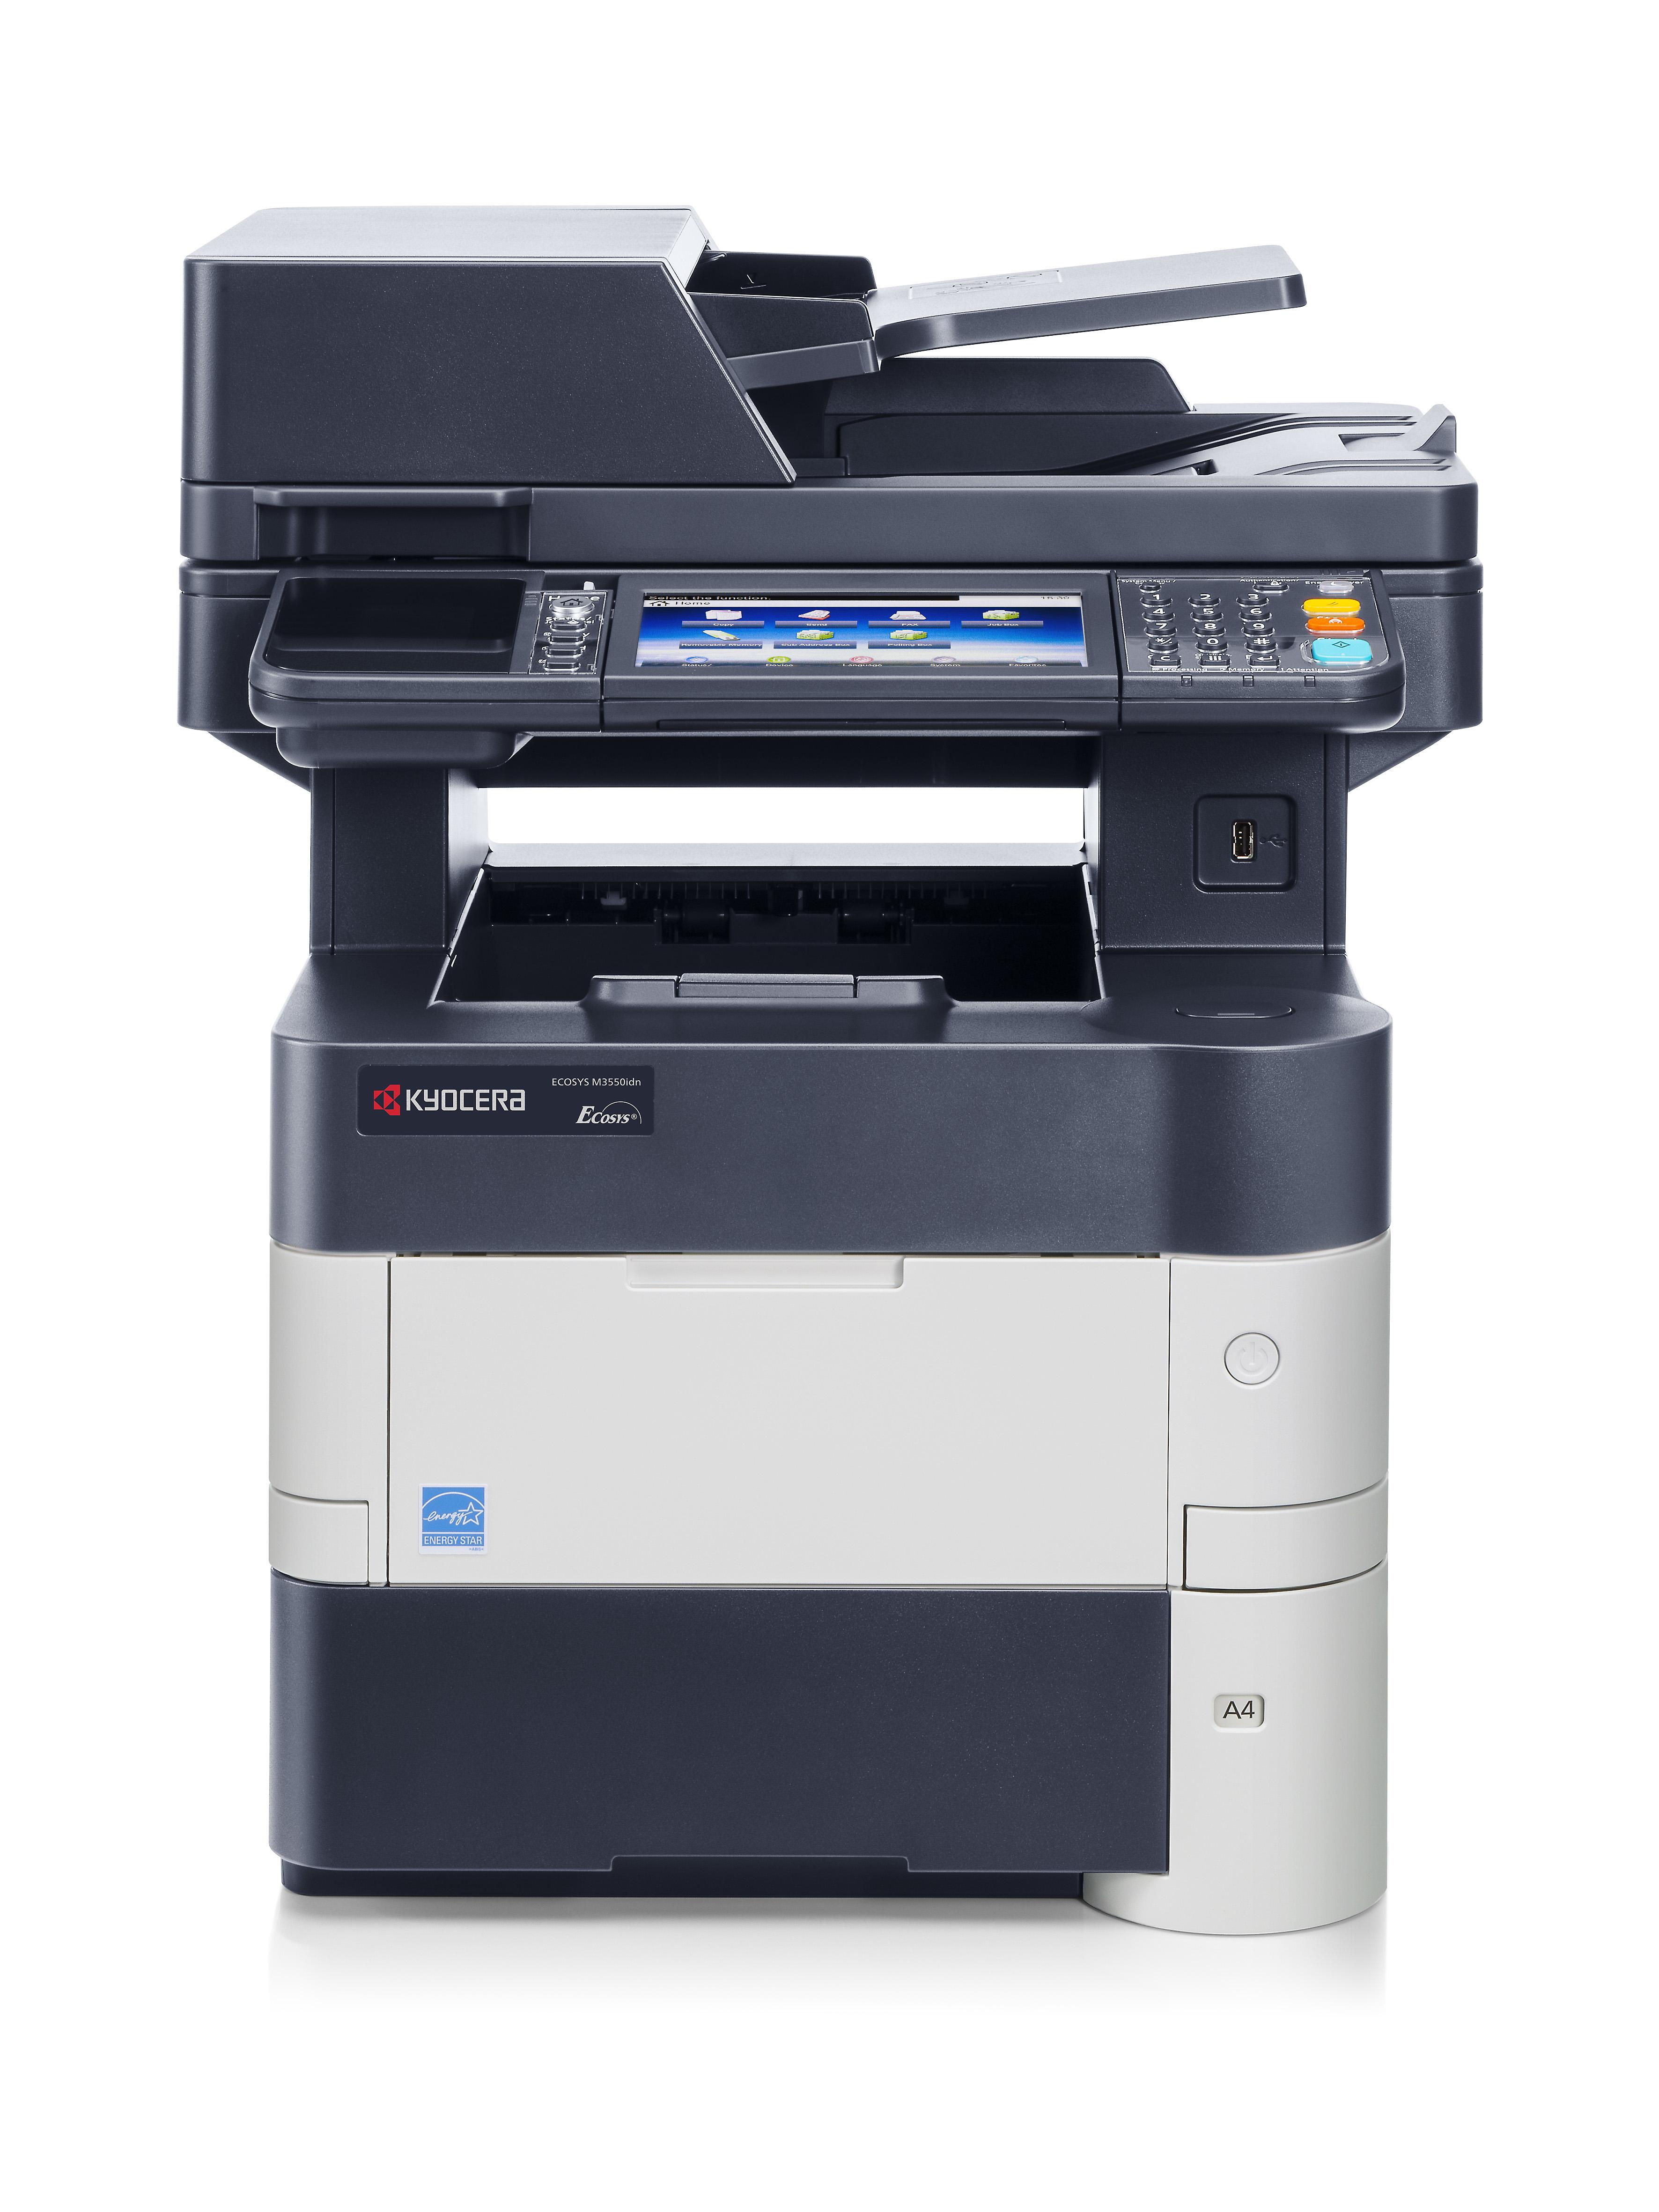 Kyocera ECOSYS M3550idn - Multifunktionsdrucker - s/w